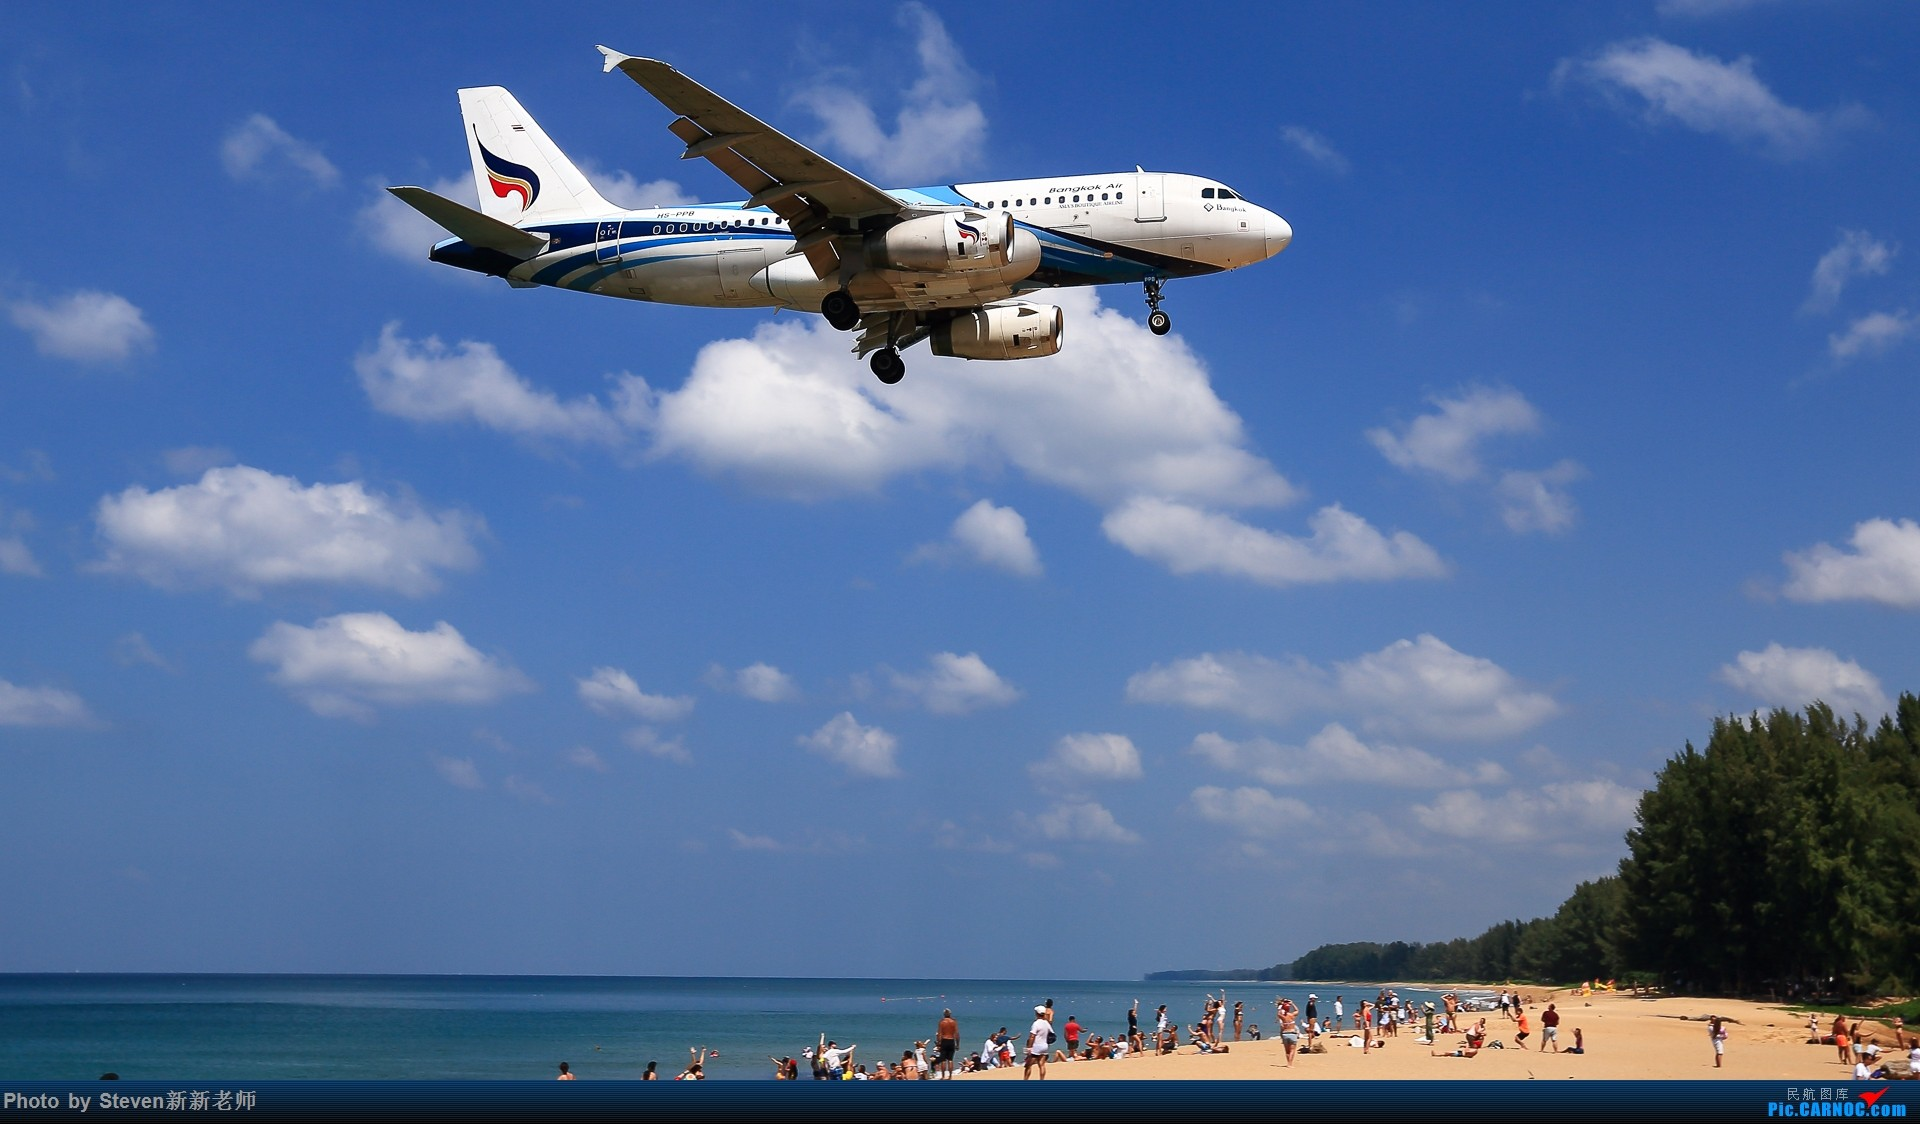 "Re:[原创]亚洲""圣马丁岛""—普吉国际机场拍机 AIRBUS A319-100 HS-PPB 泰国普吉机场"